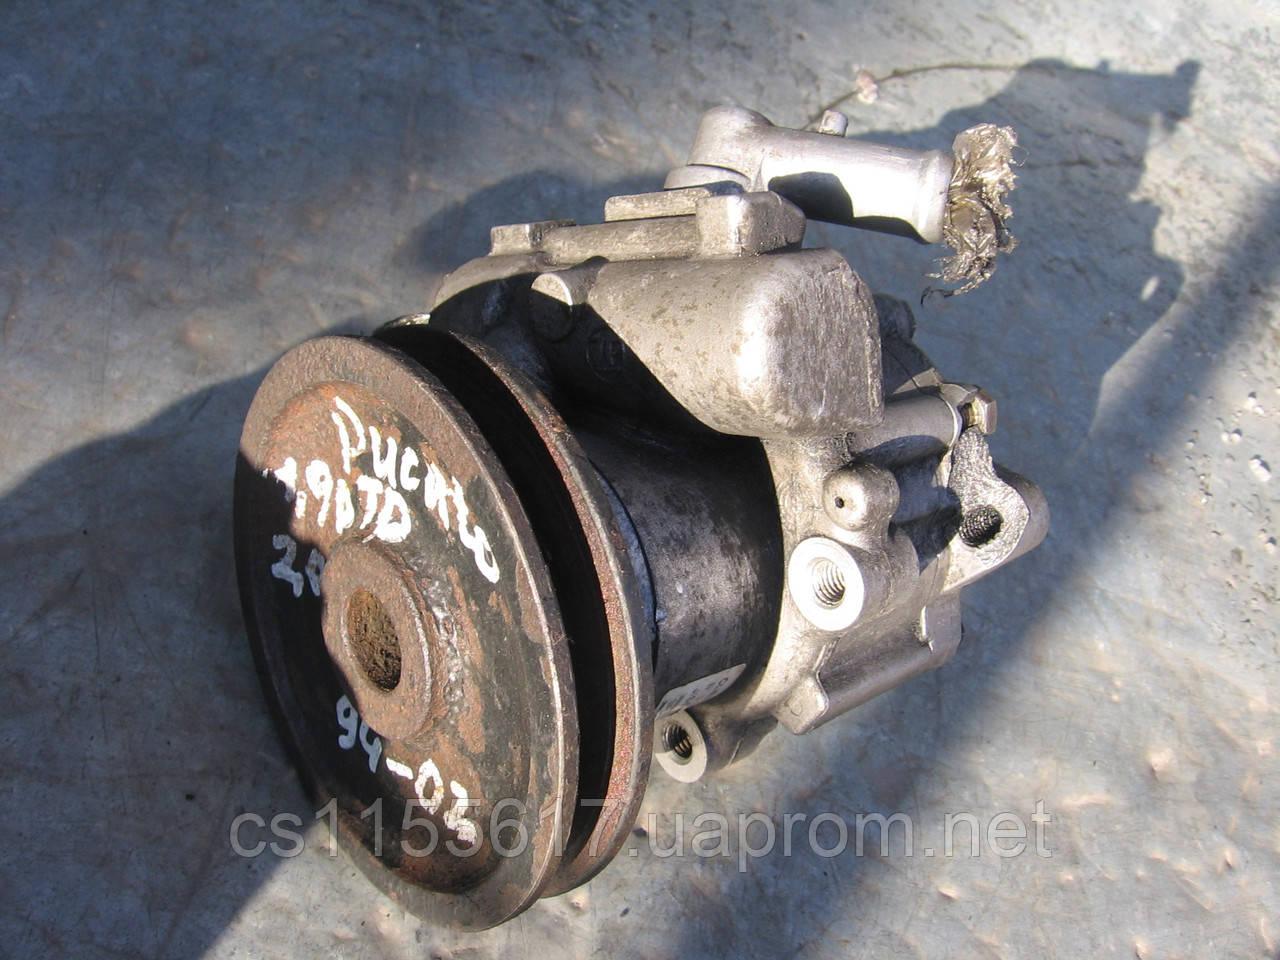 Насос гидроусилителя ZF 761395551 (дефект) б/у 2.0 на Citroen Jumper, Fiat Ducato, Peugeot Boxer год 94-02